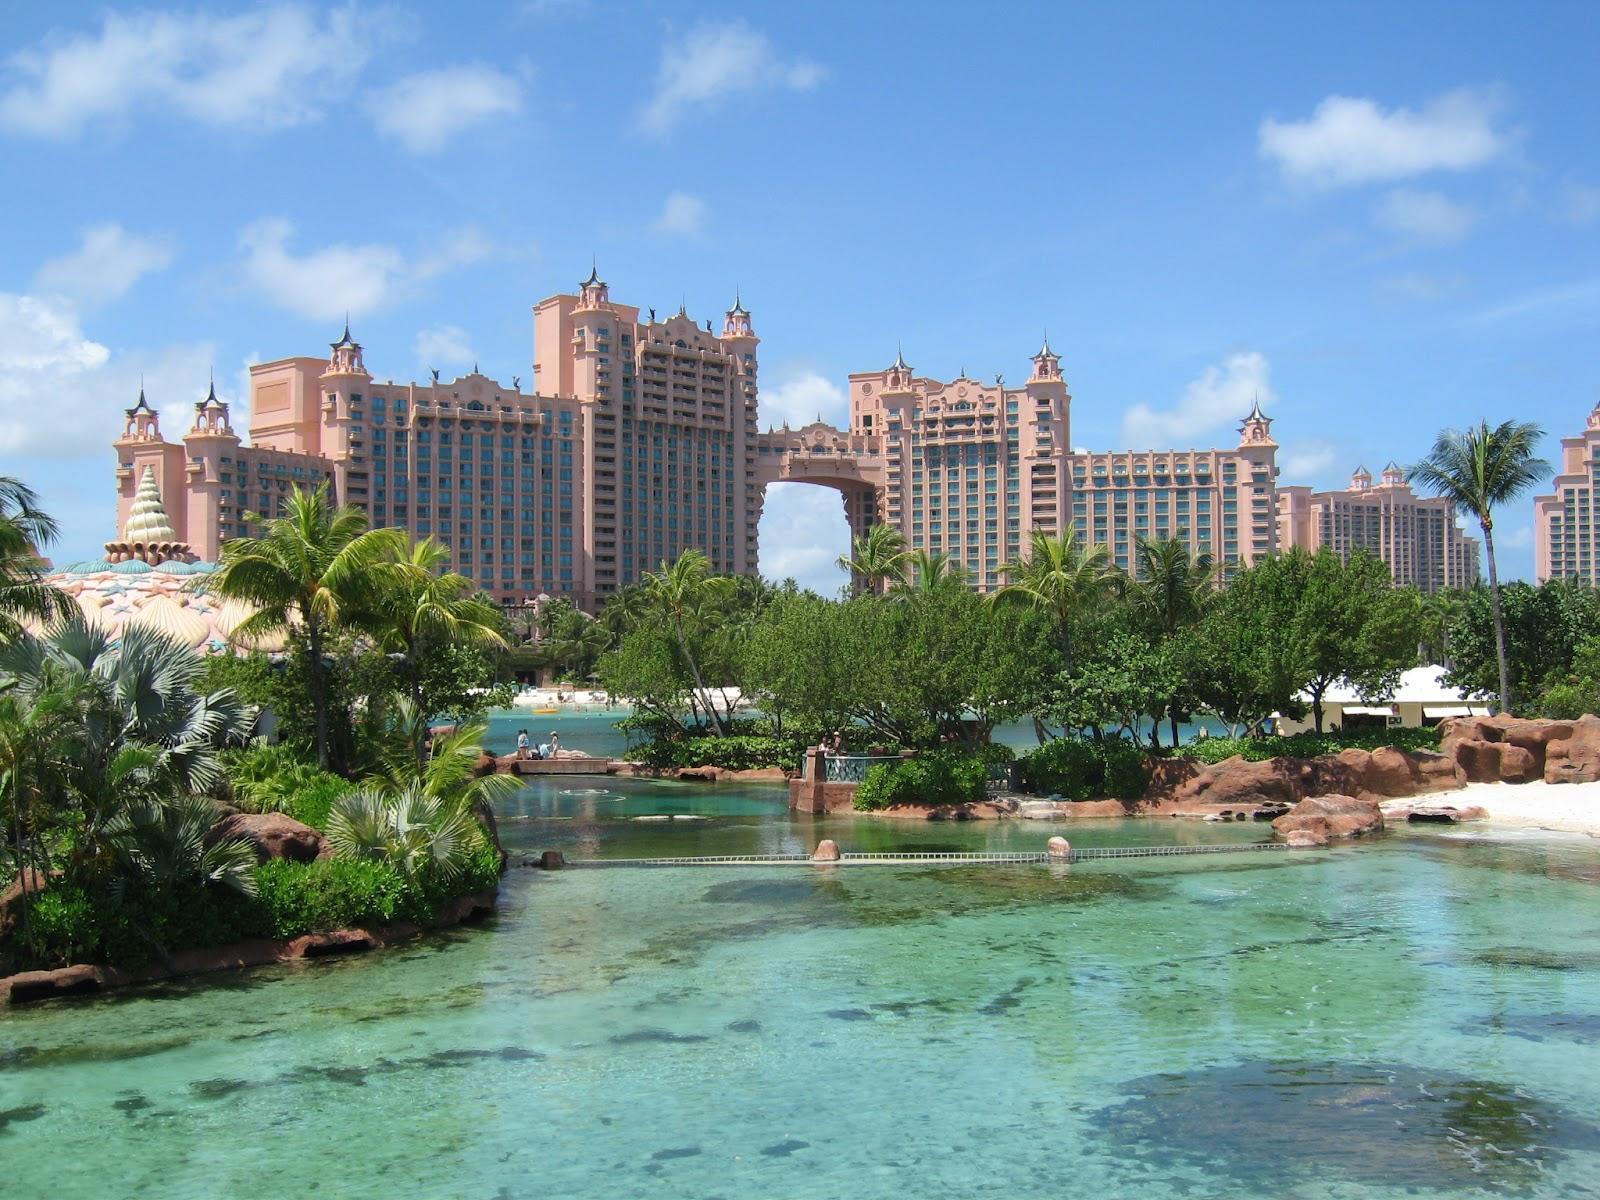 Tourism: Atlantis Paradise Island